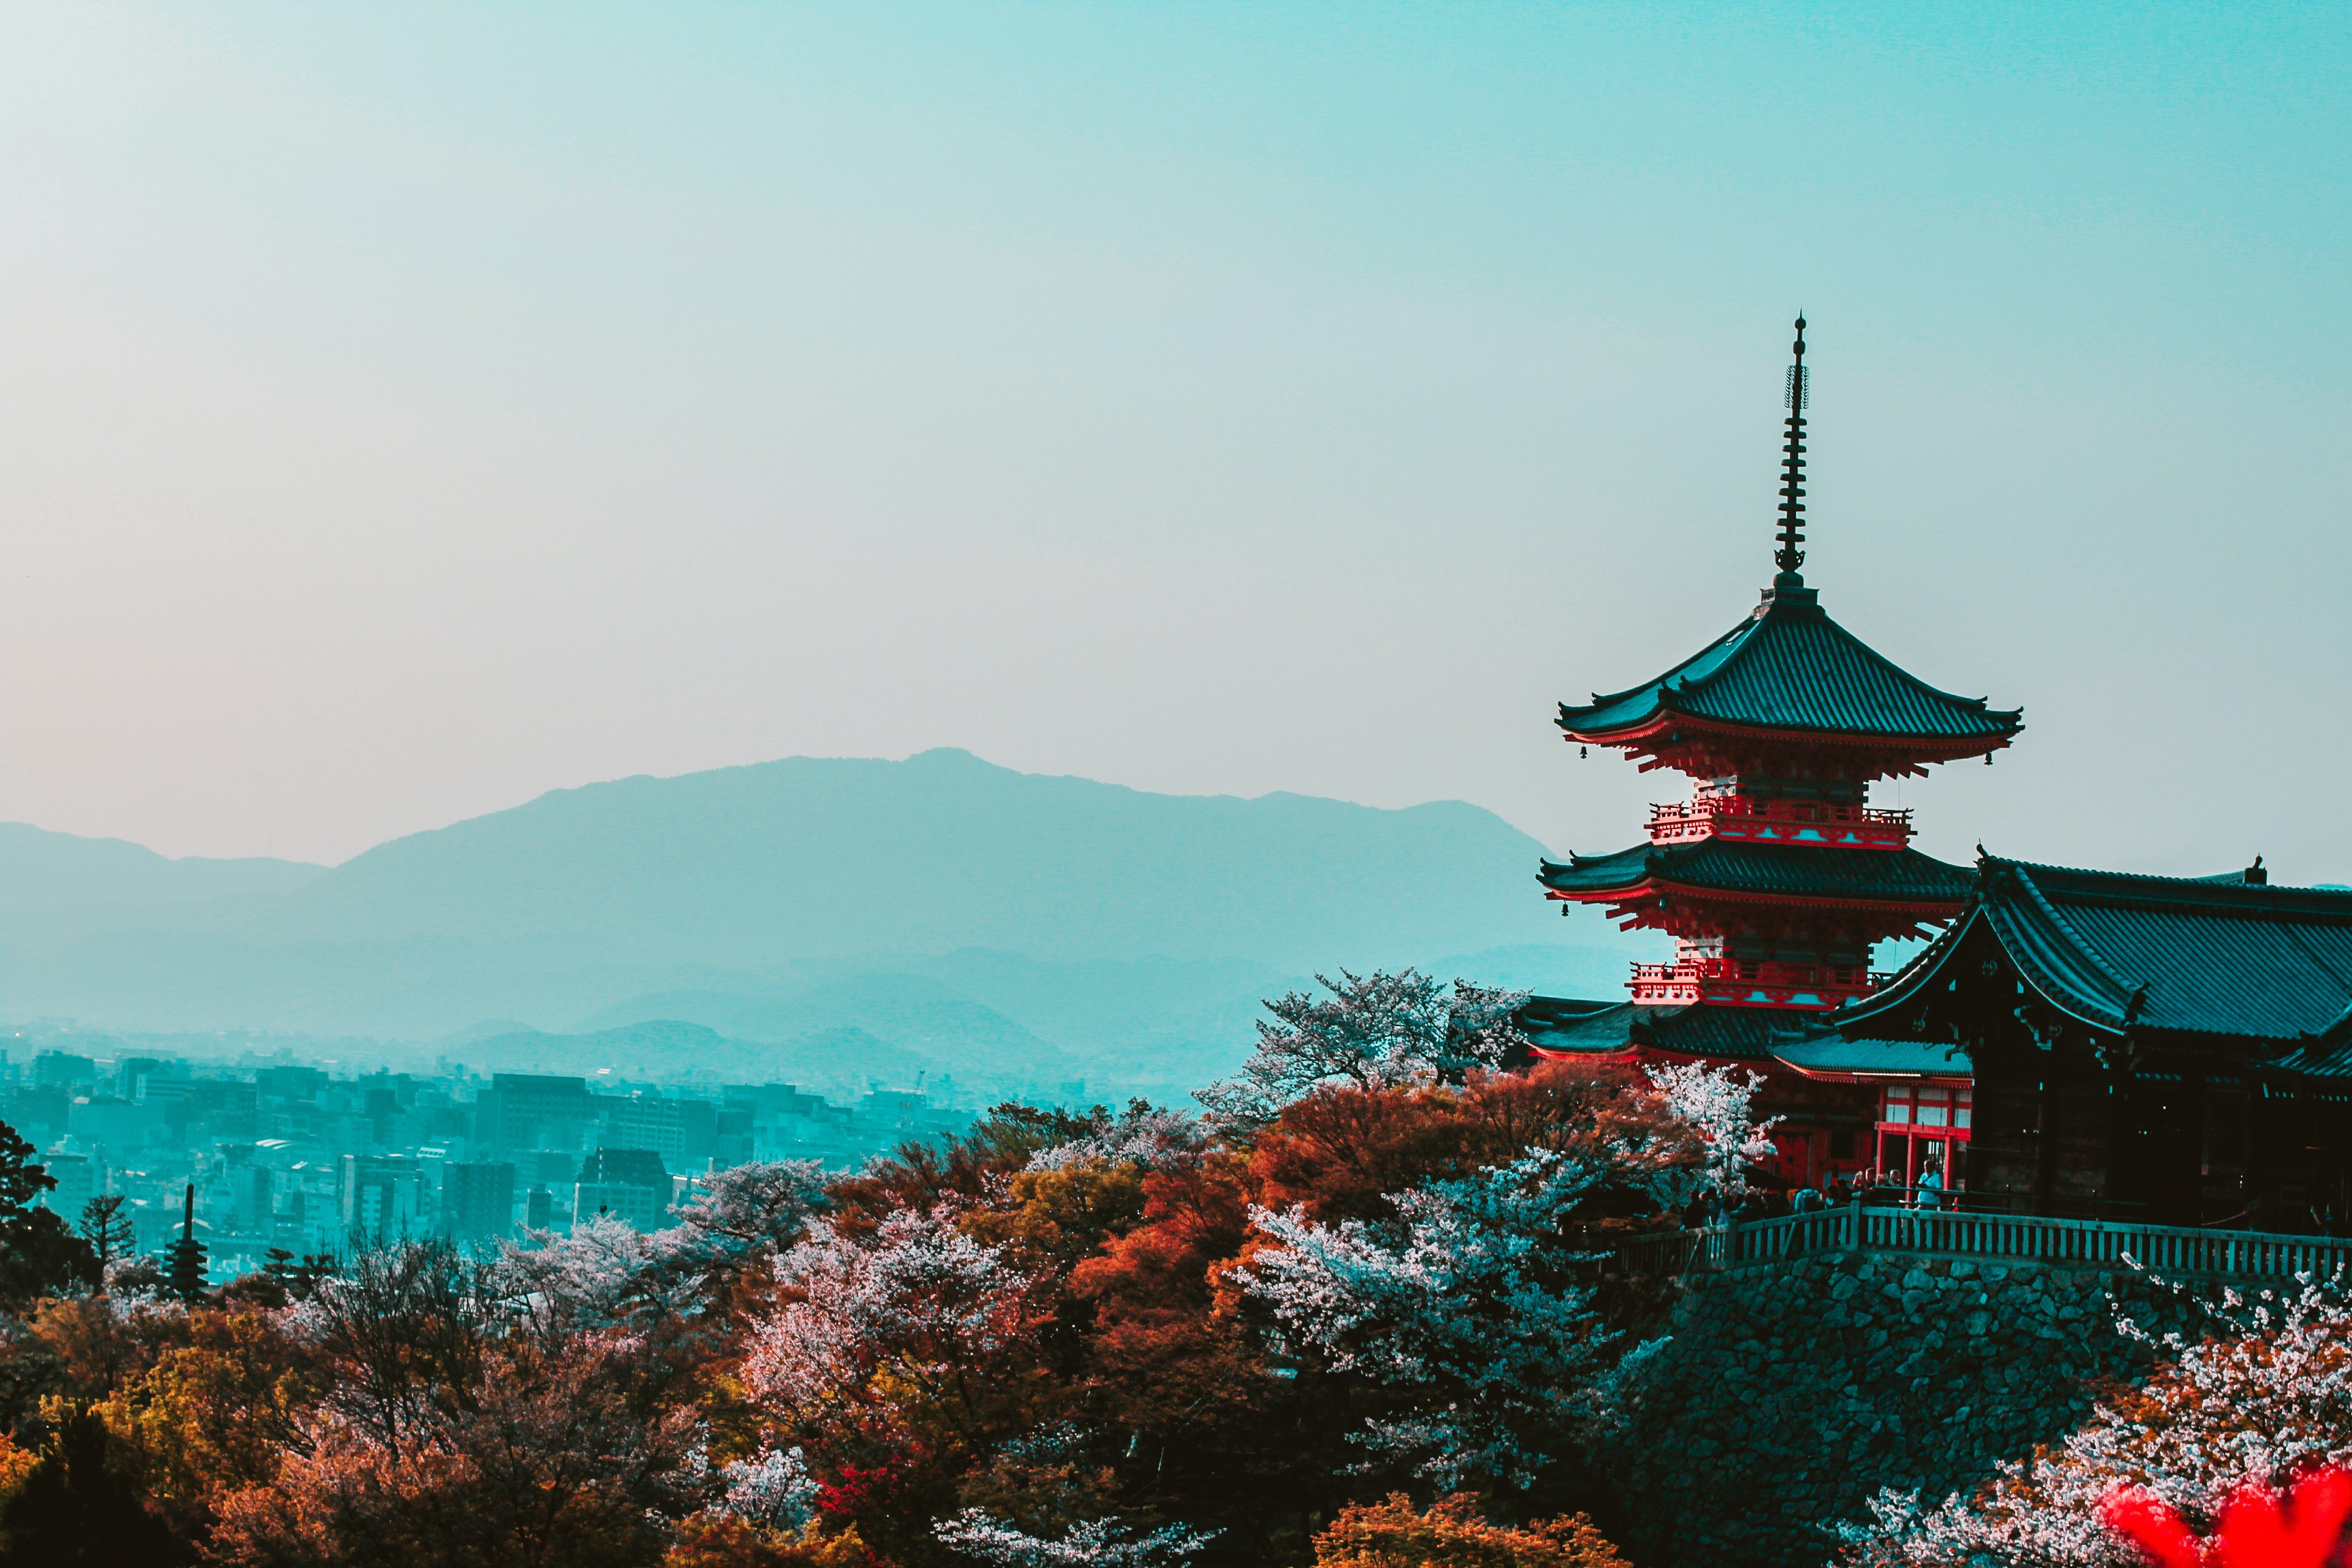 Kyoto, Japan, World's Most Romantic Cities